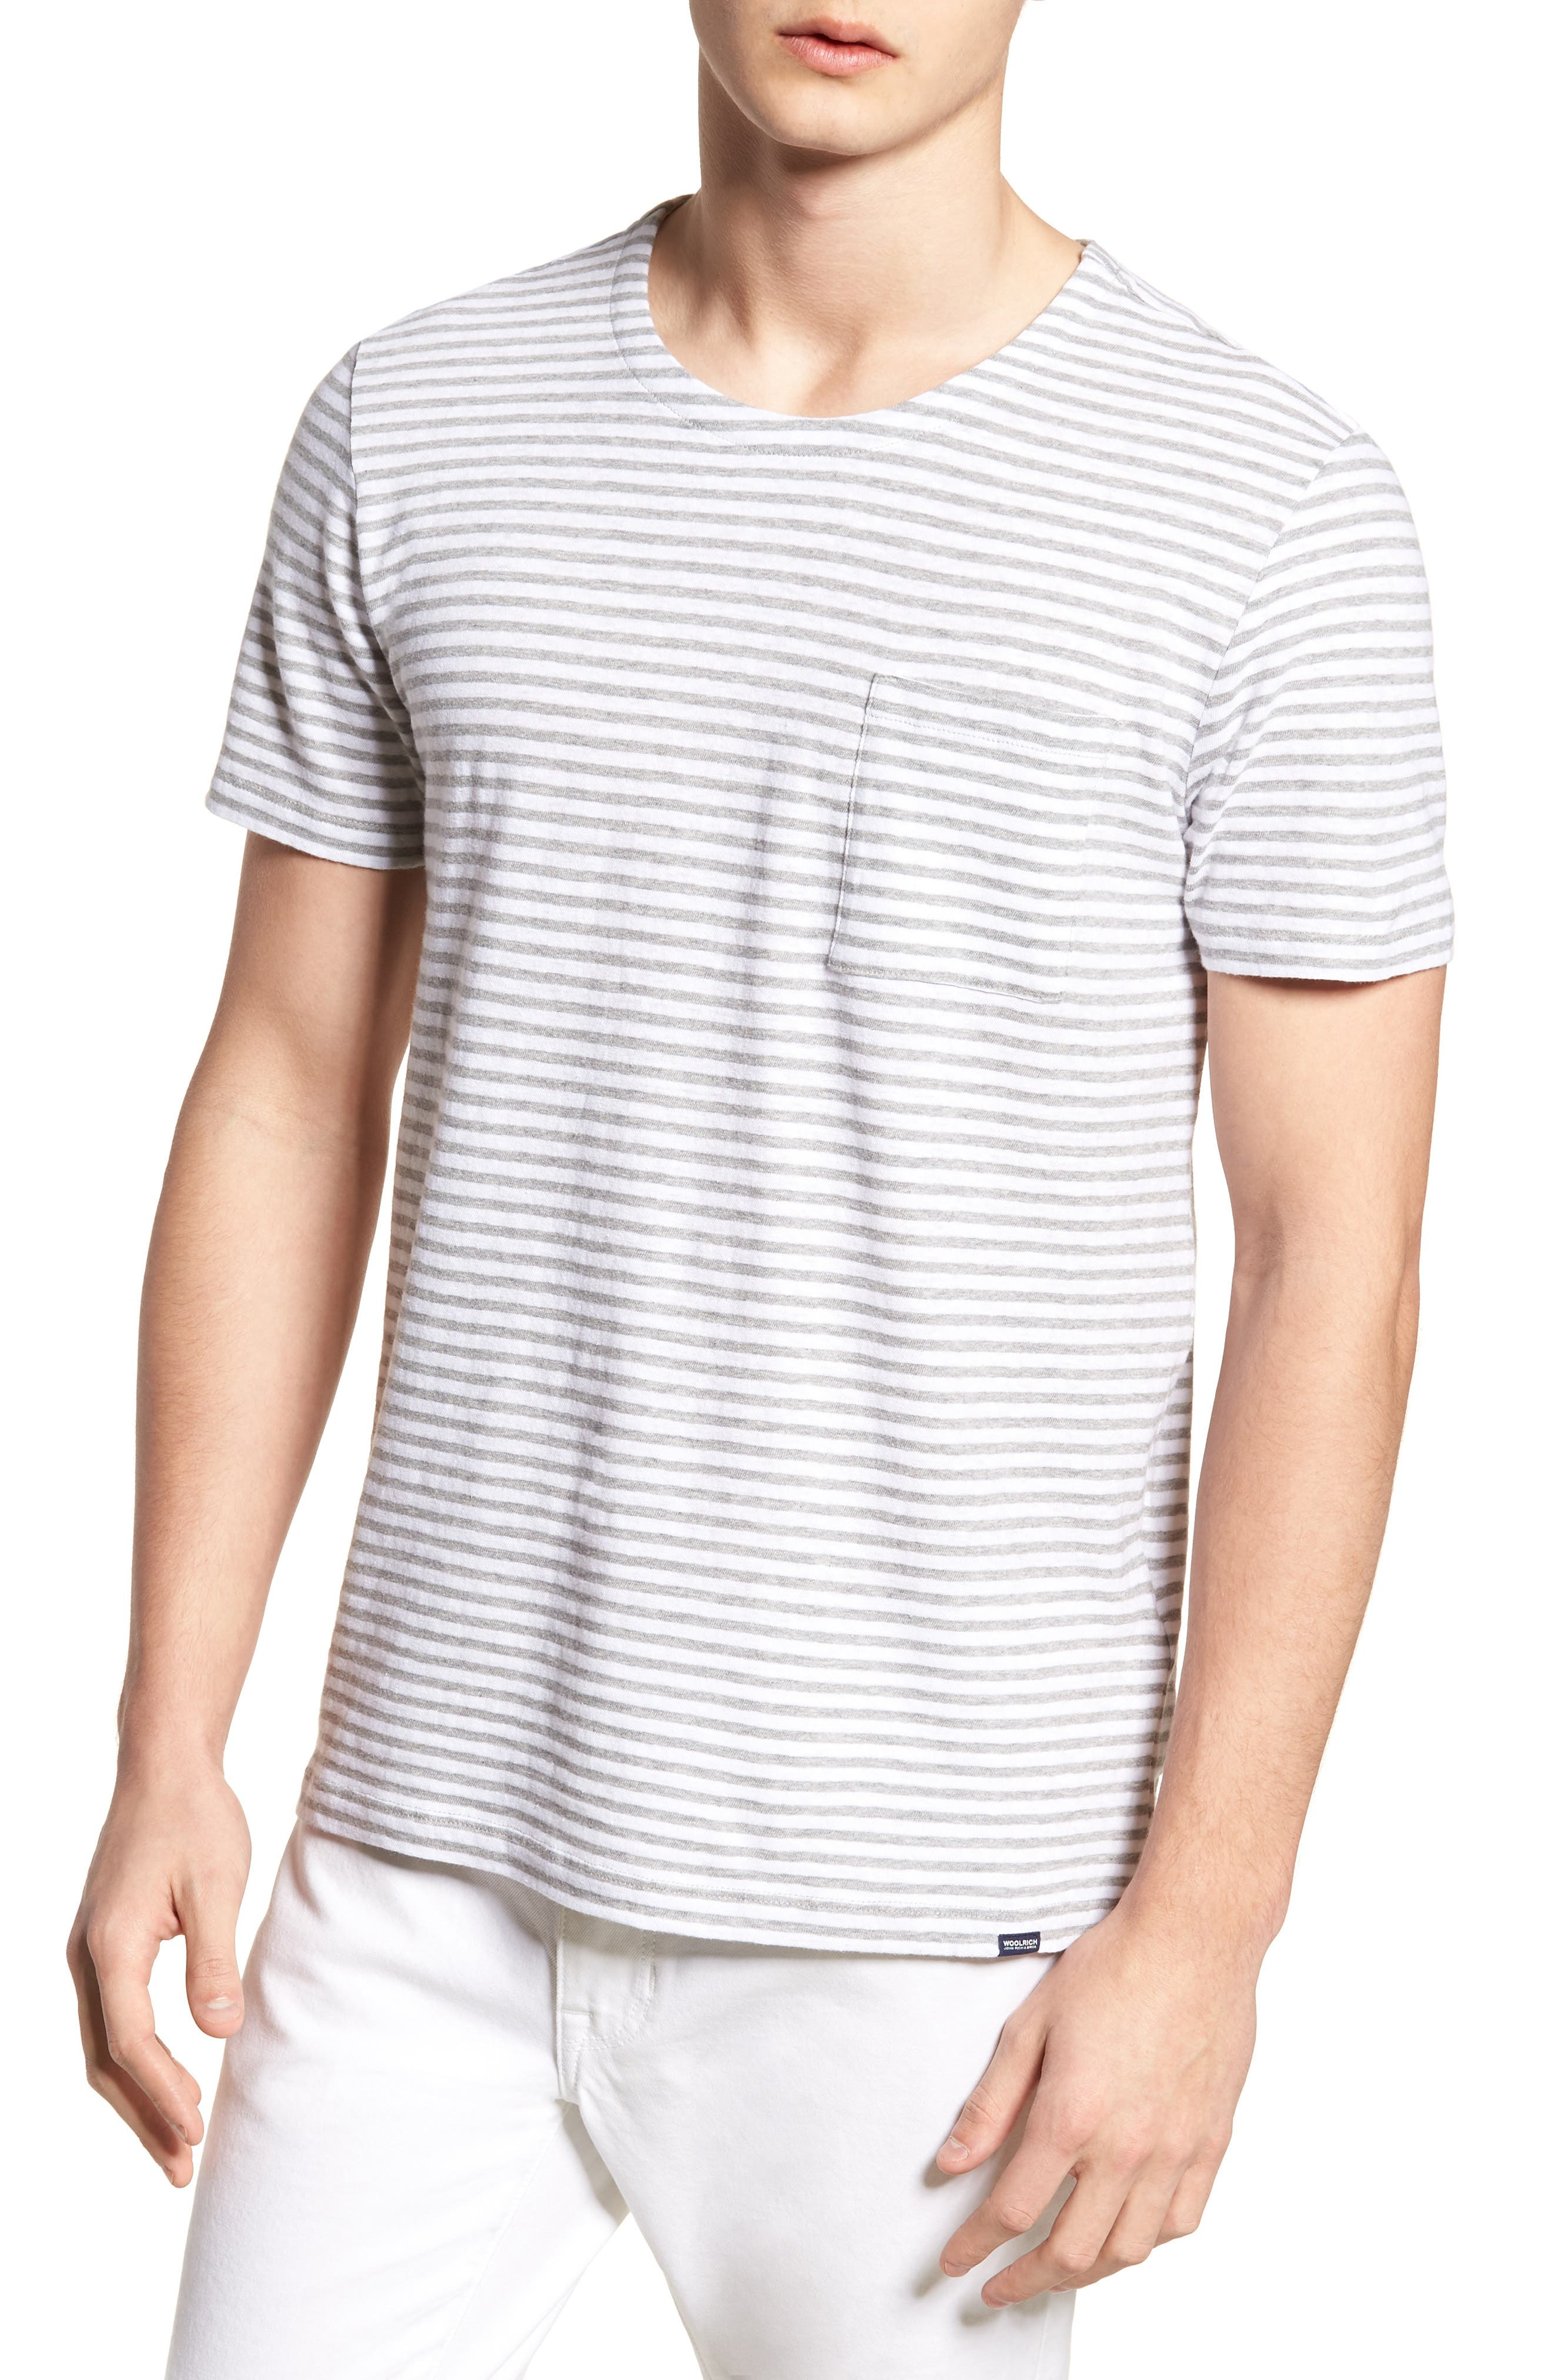 & Bros. Stripe Crewneck T-Shirt,                             Main thumbnail 1, color,                             156